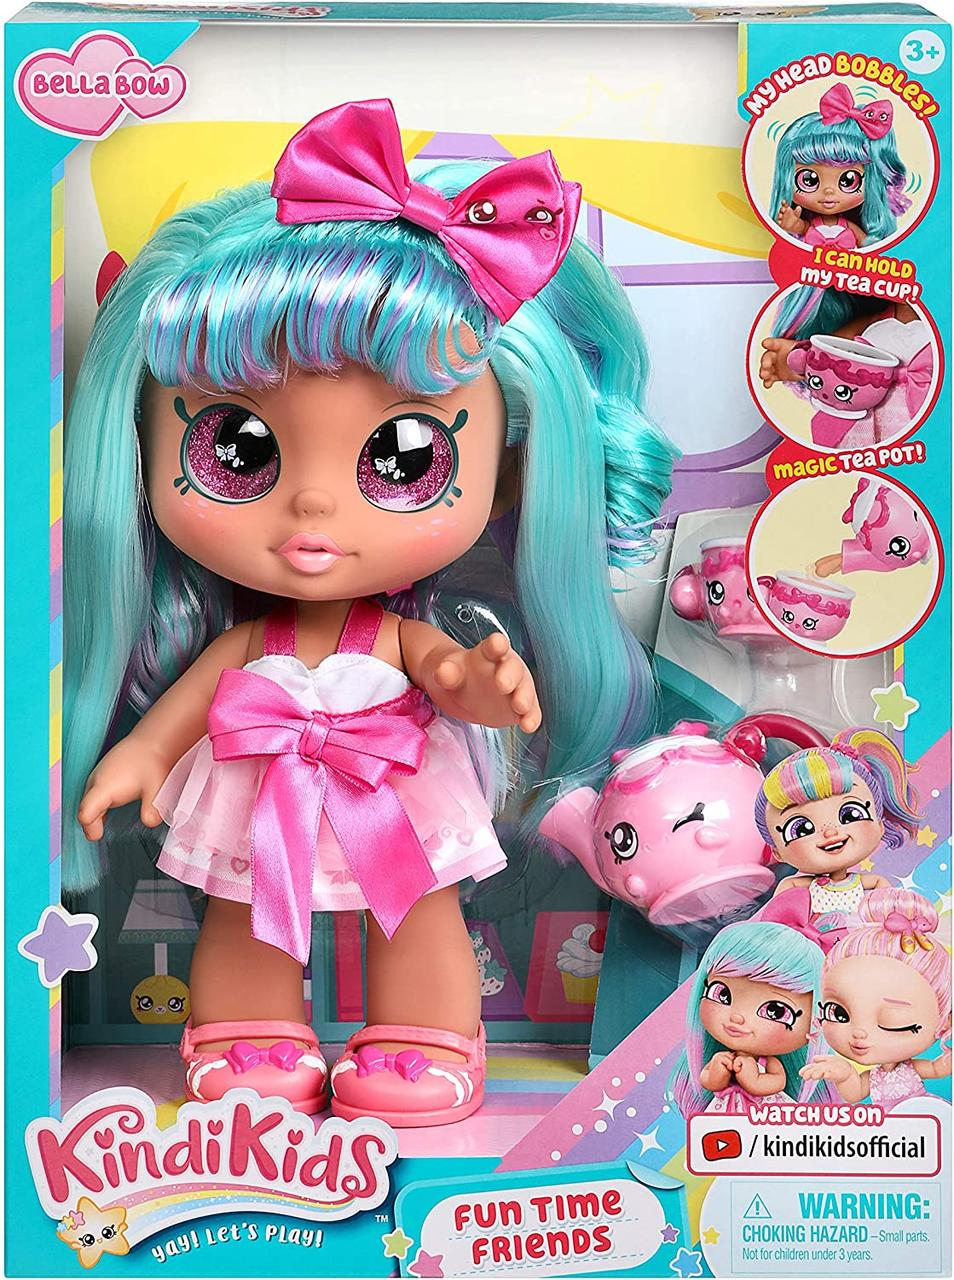 Кукла кинди кидс Белла Боу Время друзей kindi kids Bella Bow Snack Time Friends 50116